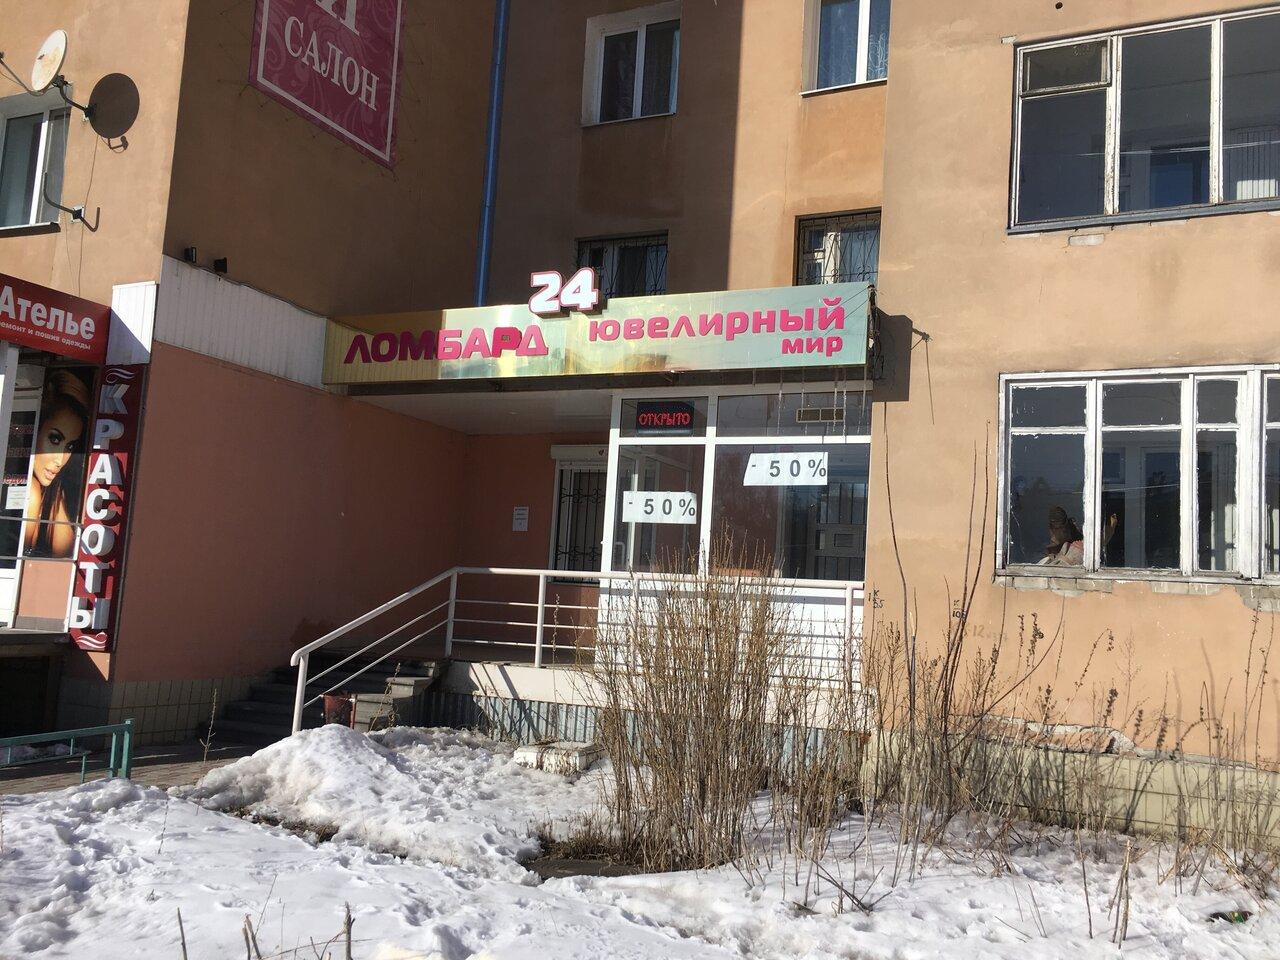 Новгород ломбард лев нижний часовая техника ломбард